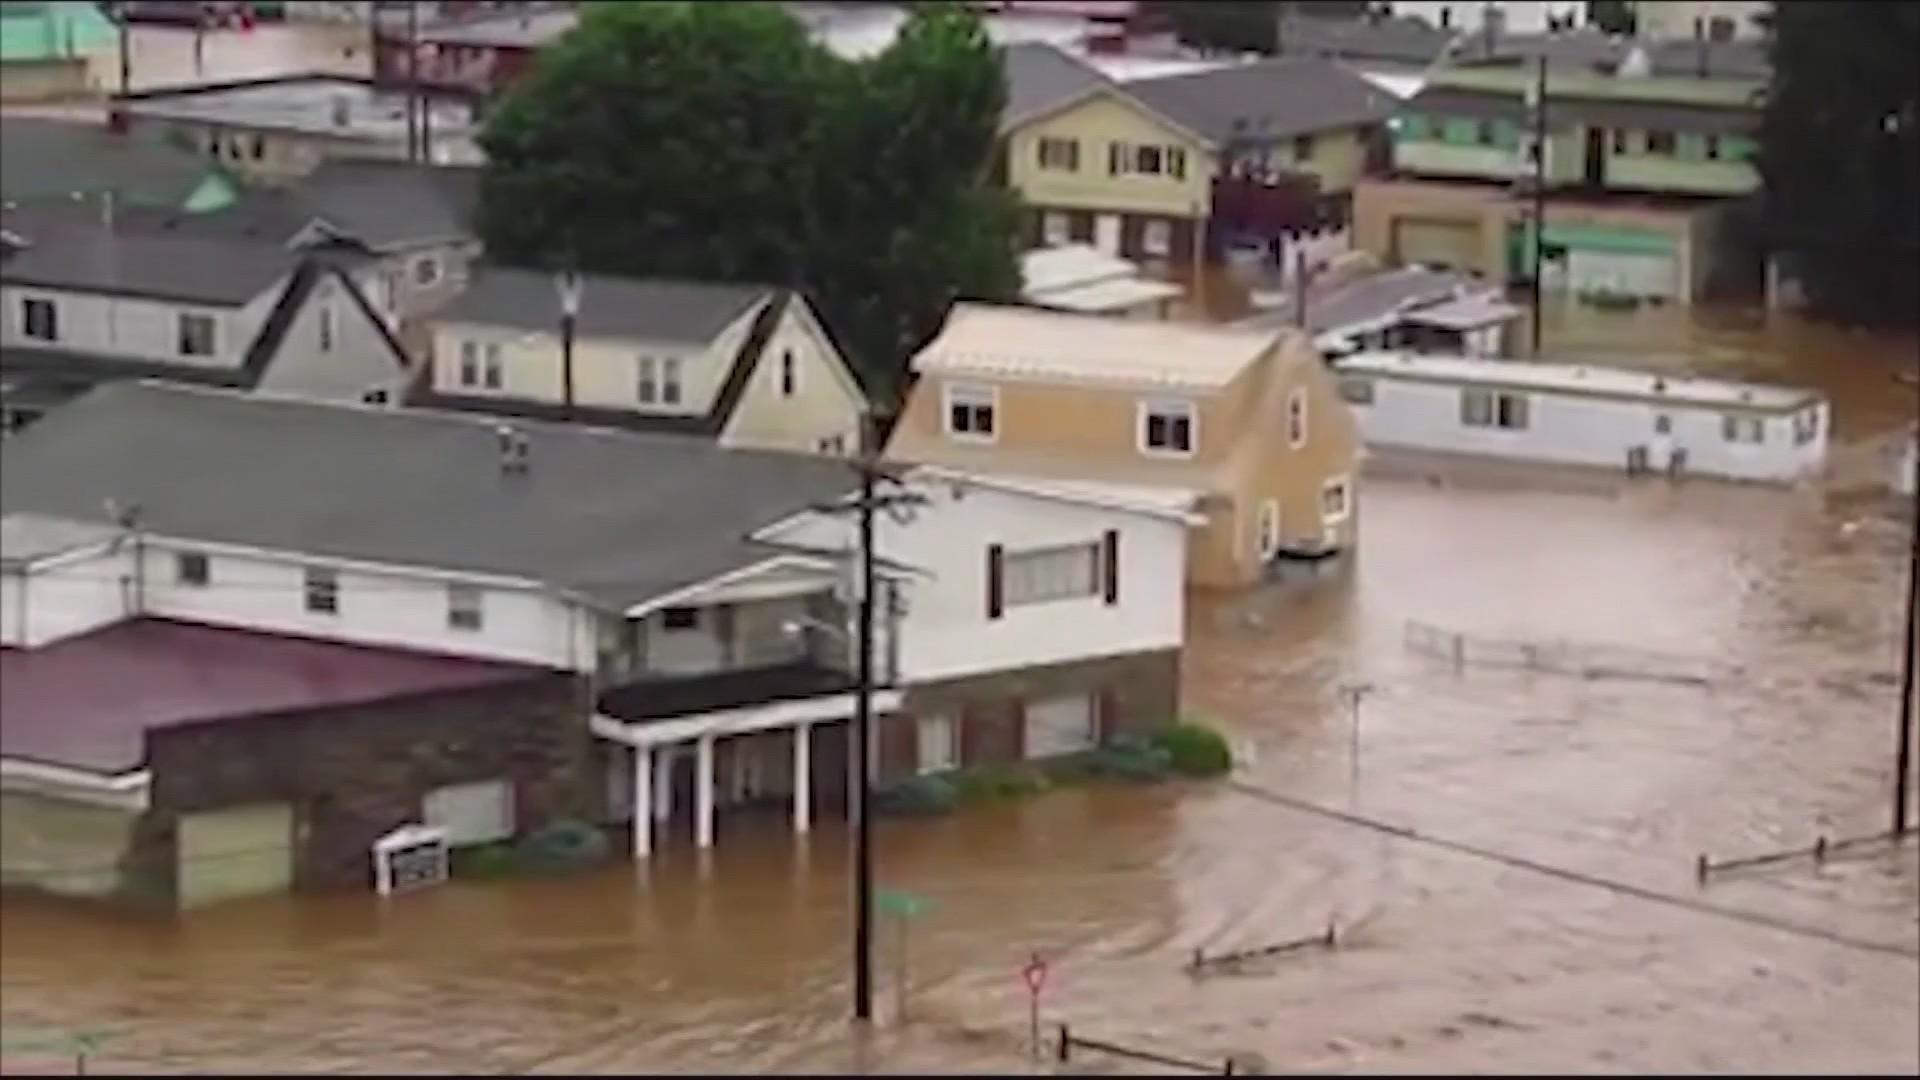 West_Virginia_Committee_on_Flooding_Retu_0_20190404221516